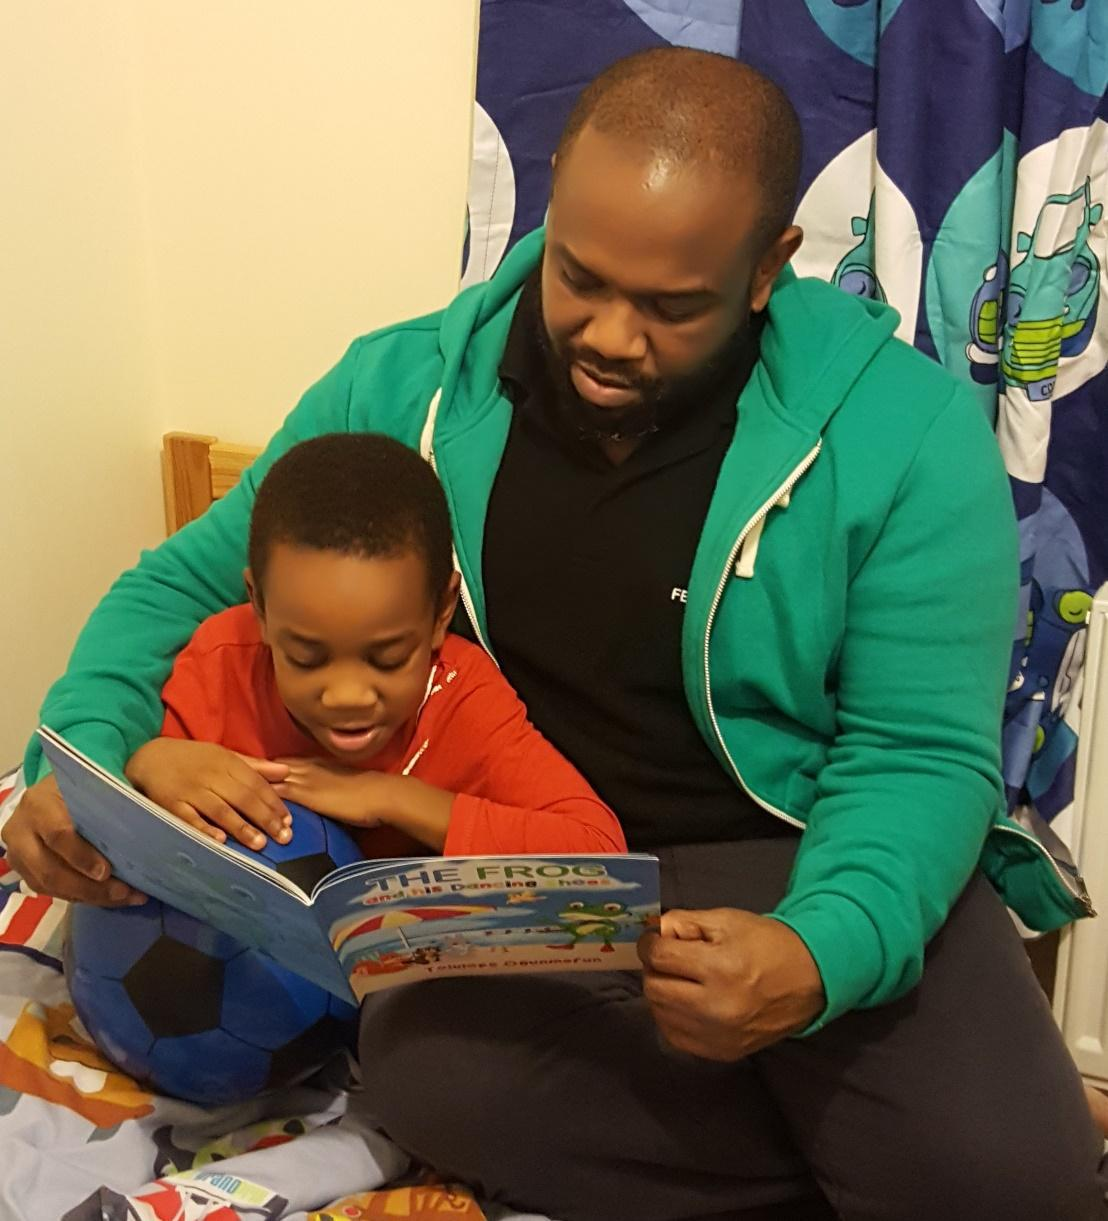 THE BEST STORIES FOR PRIMARY SCHOOL CHILDREN